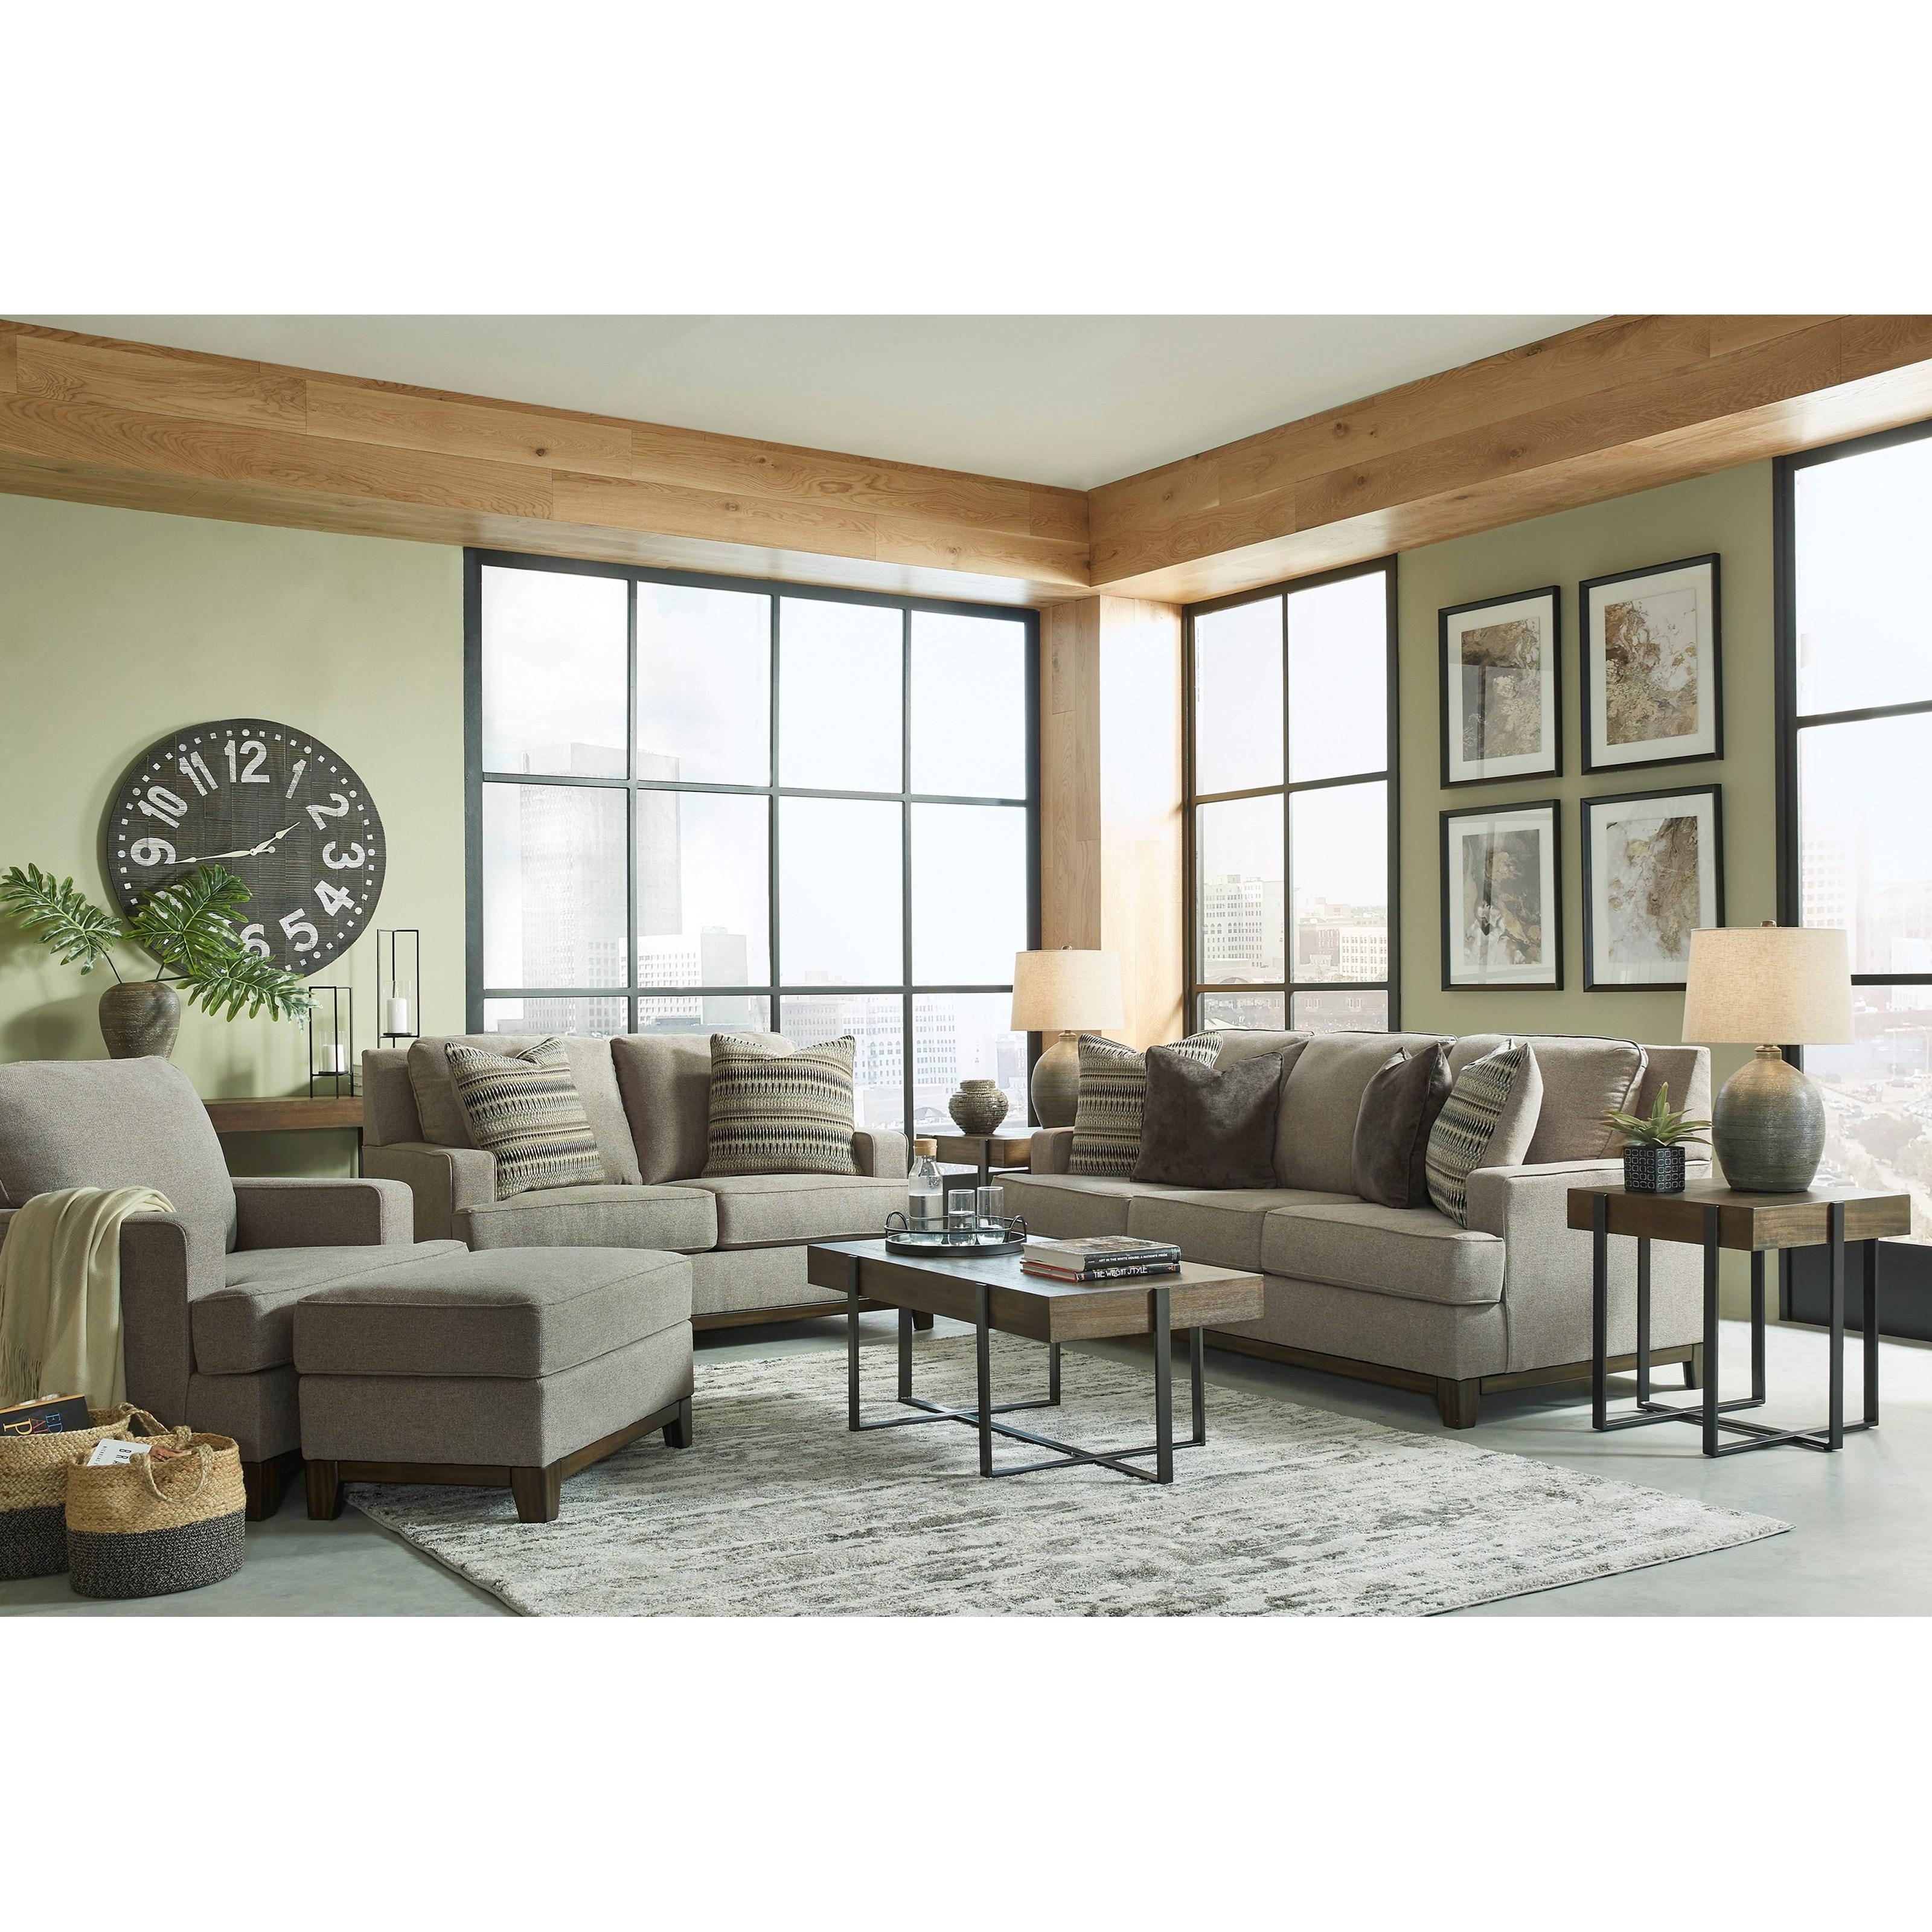 Sofa, Loveseat, Chair, and Ottoman